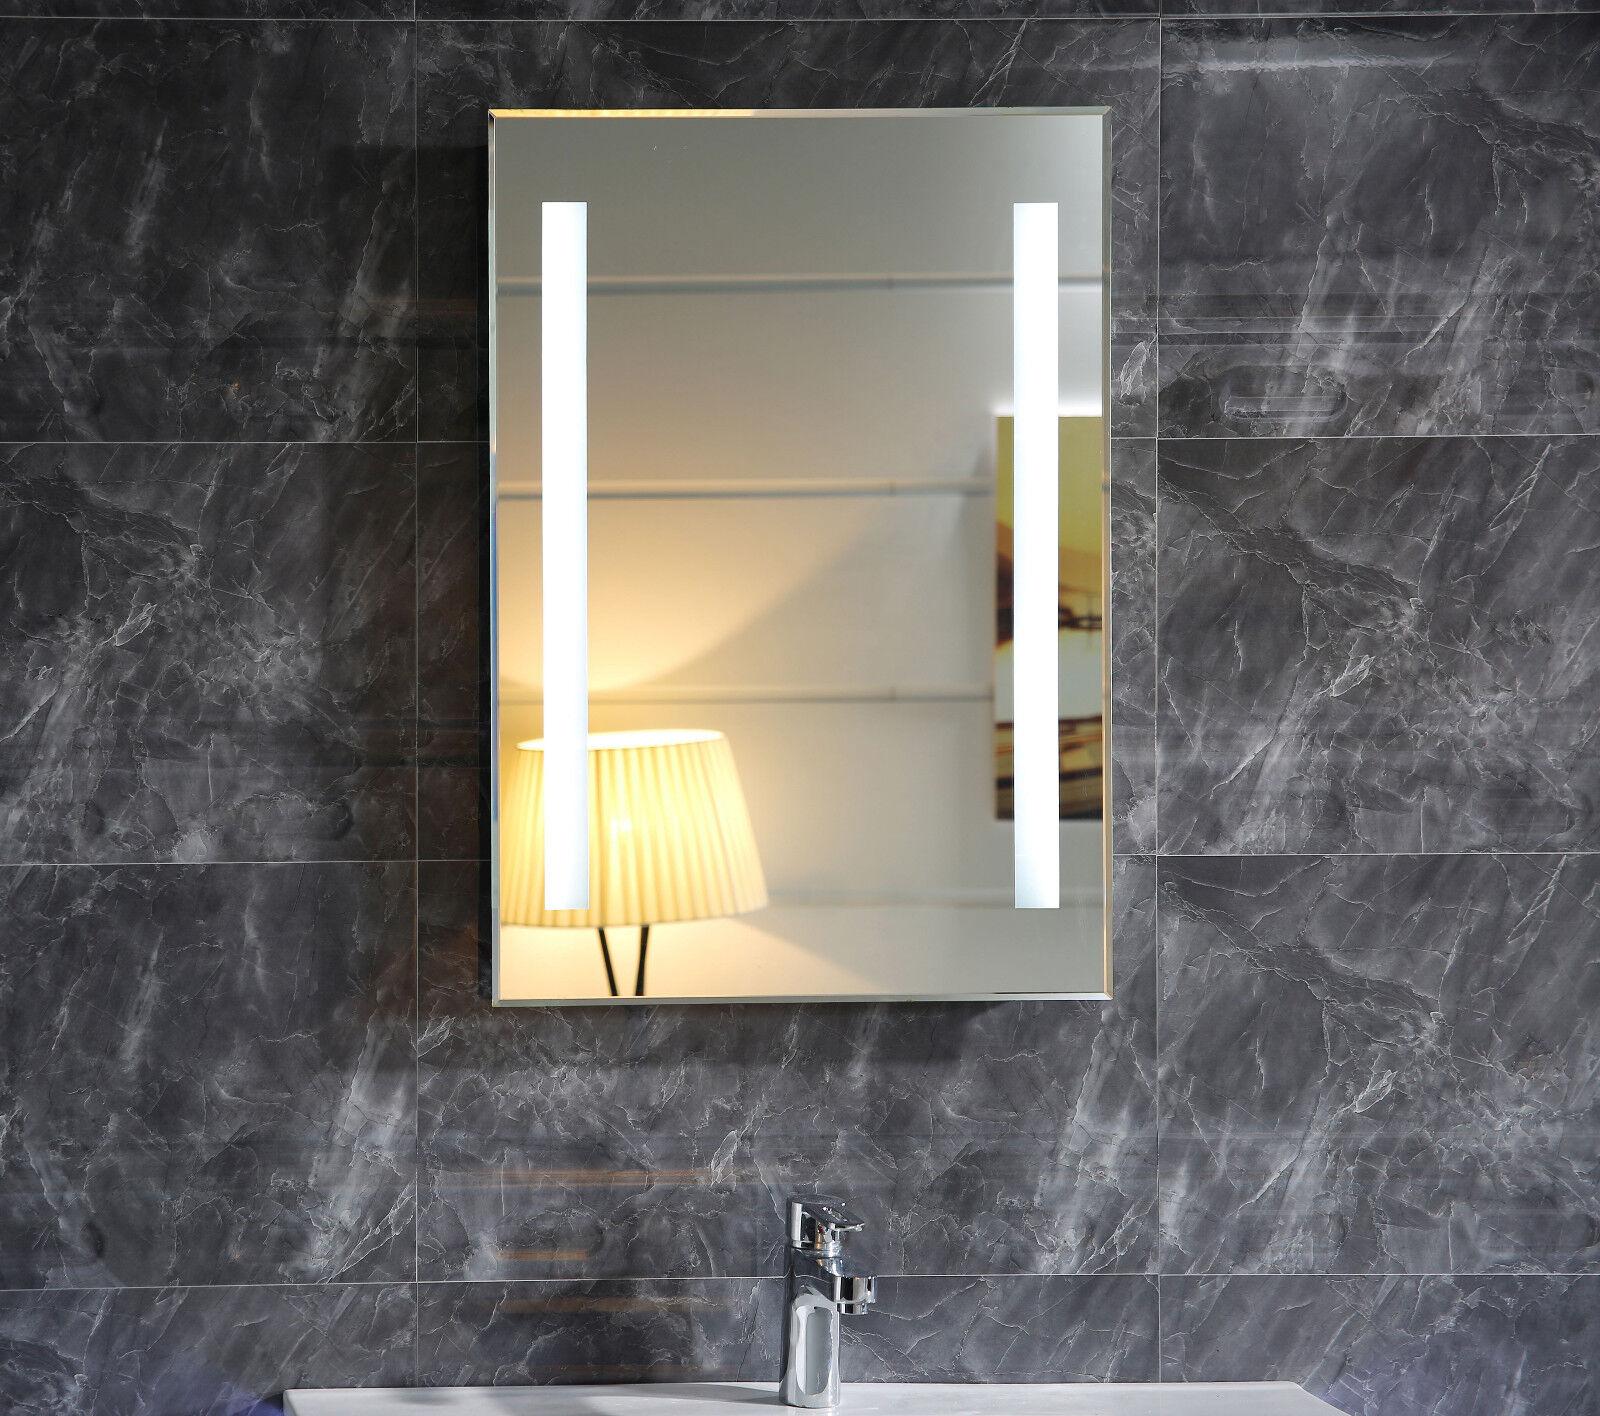 LED Badspiegel mit Beleuchtung GS055N - (B) 50 cm x (H) 70 cm